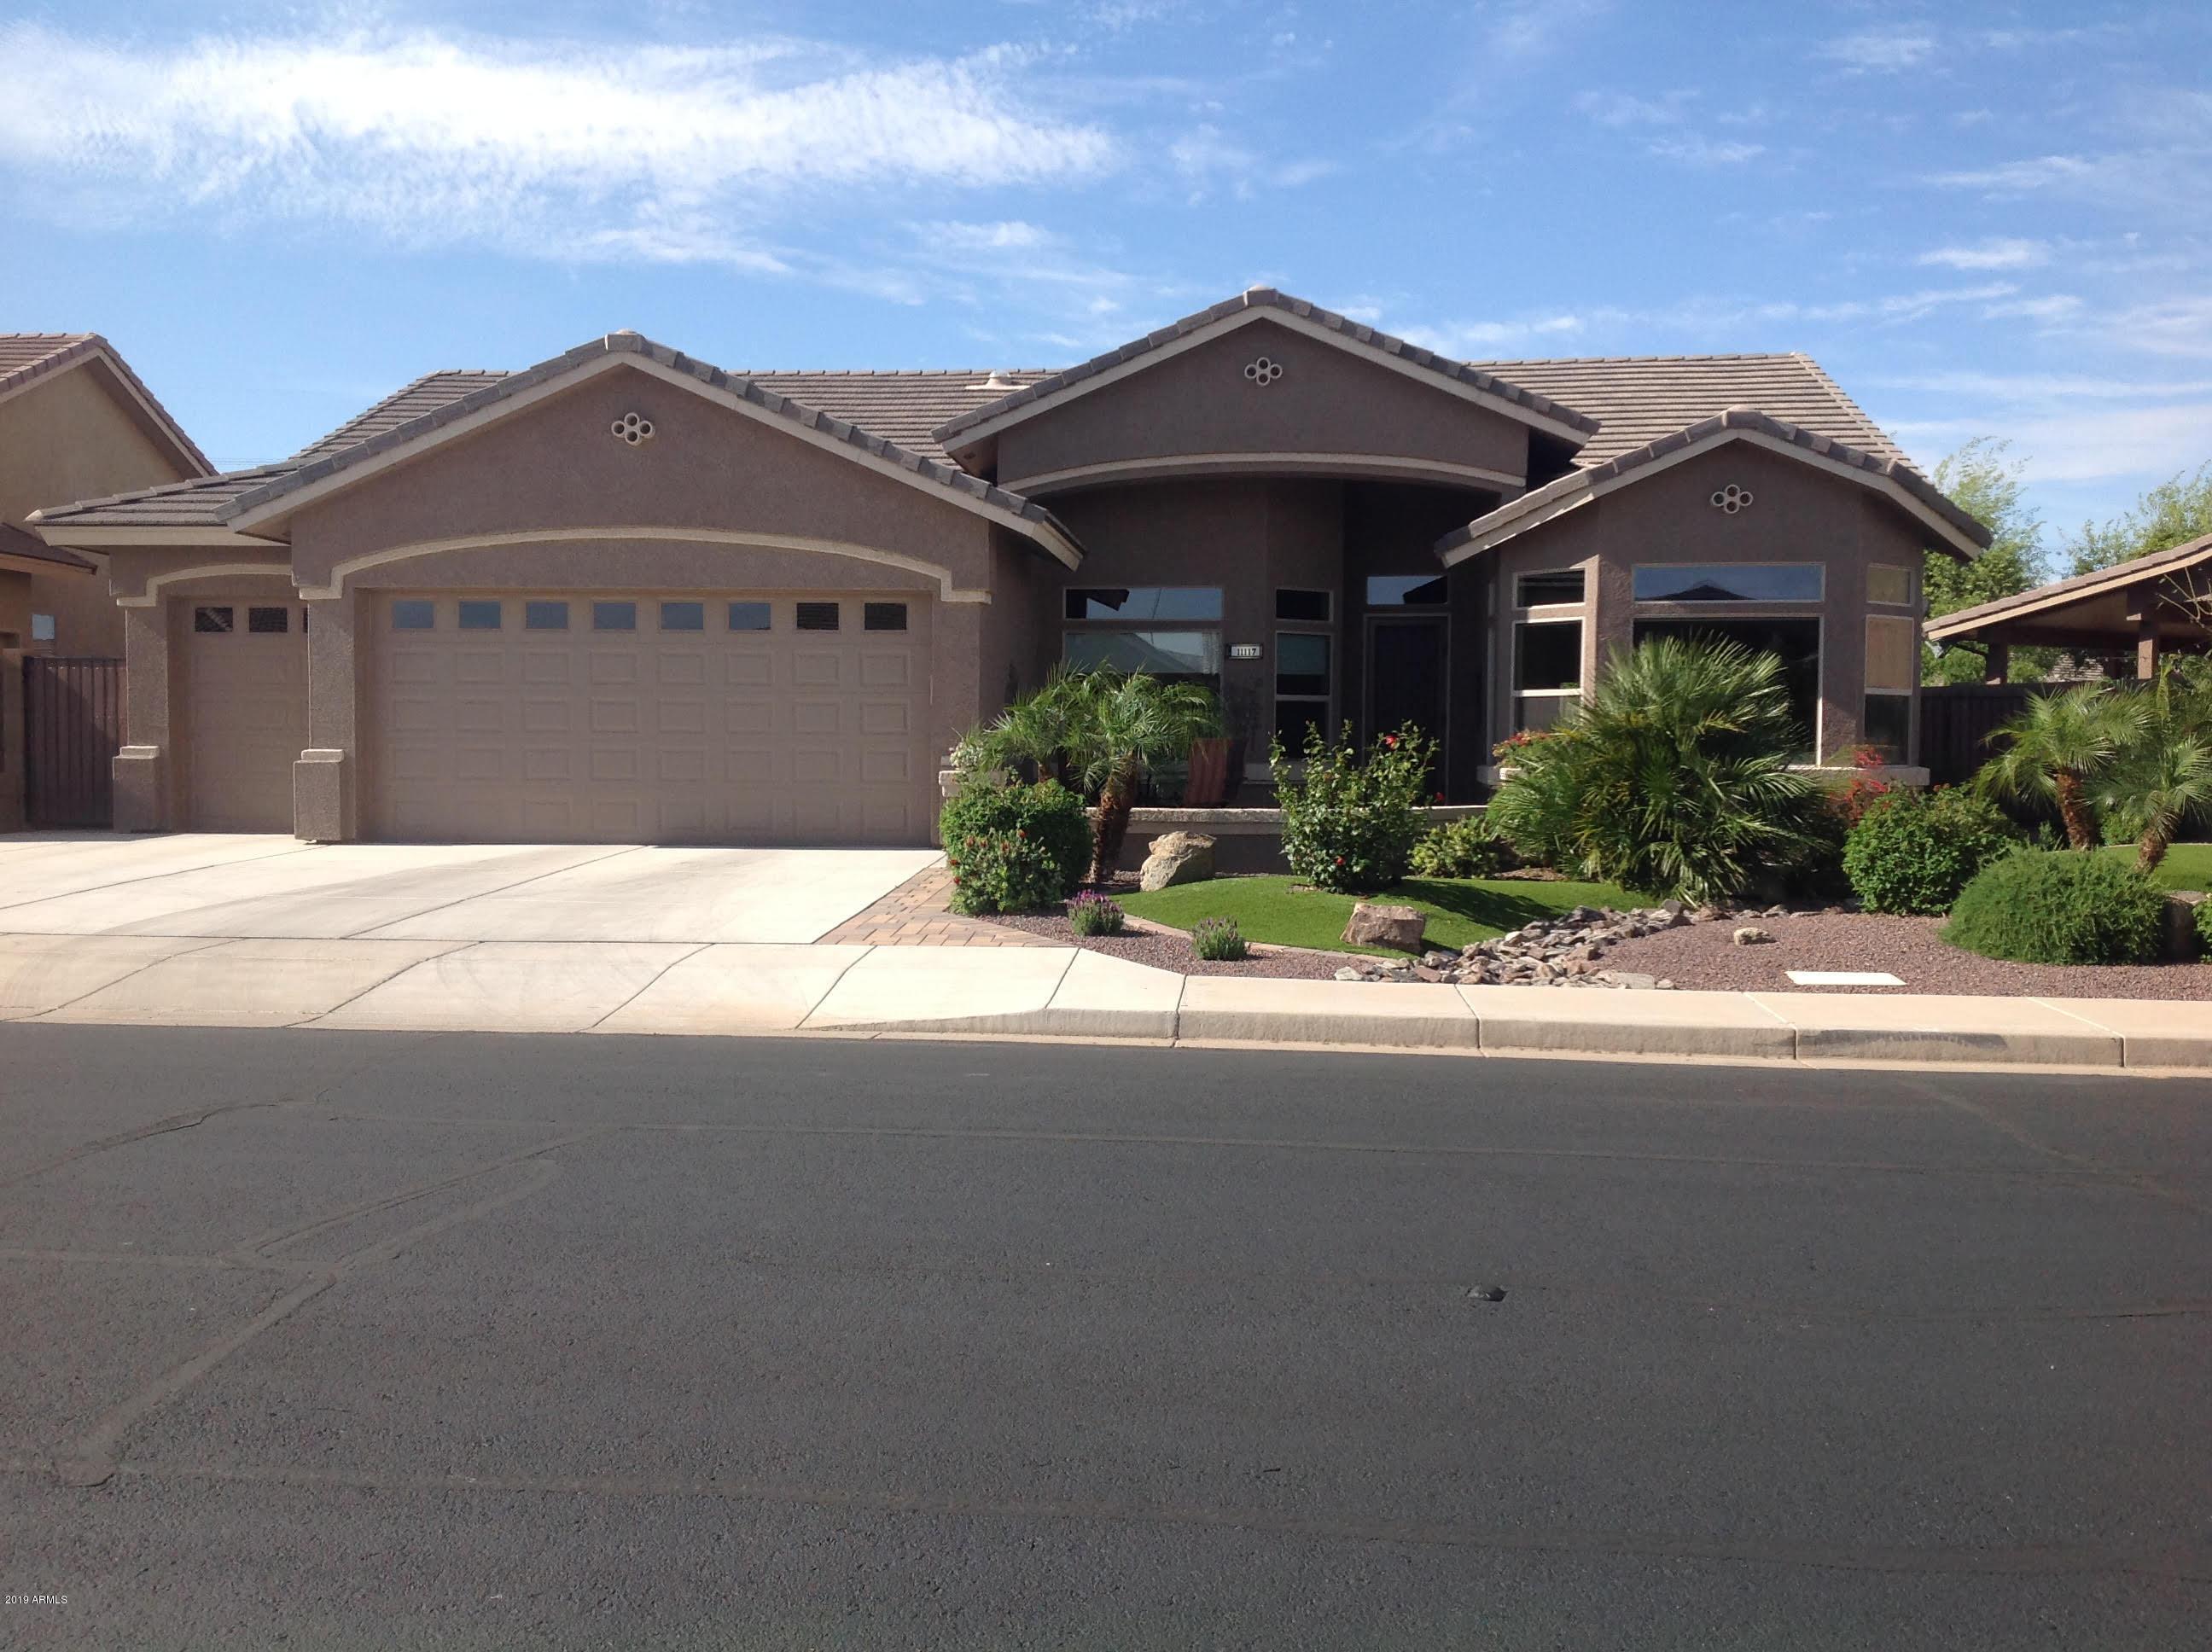 Photo of 11117 E OCASO Avenue, Mesa, AZ 85212